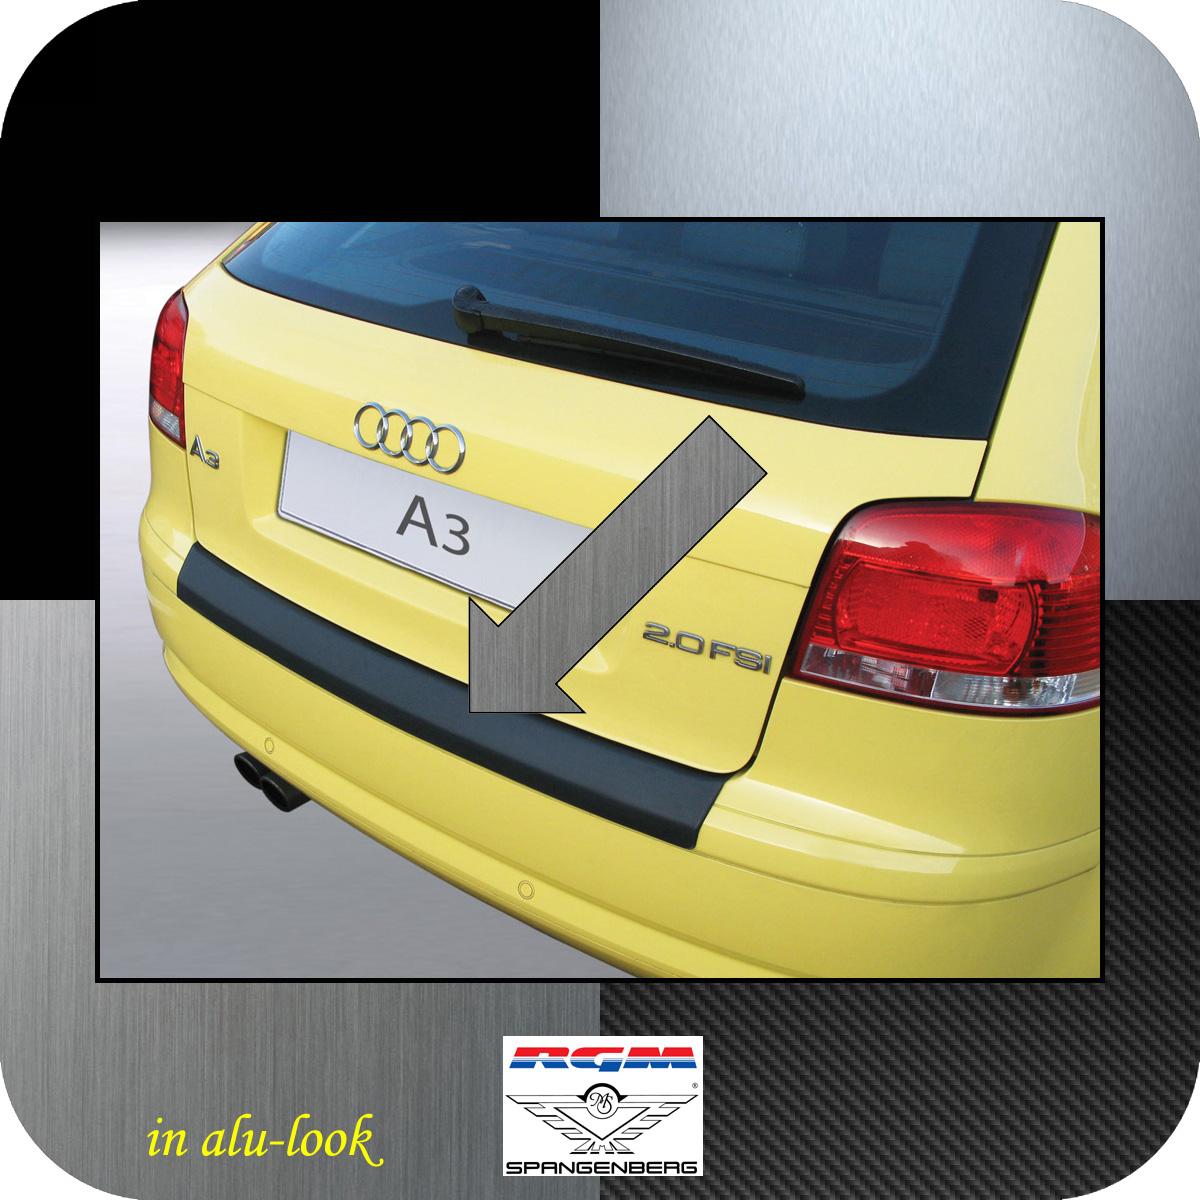 Ladekantenschutz Alu-Look Audi A3 Schrägheck vor facelift II 2003-08 3504366